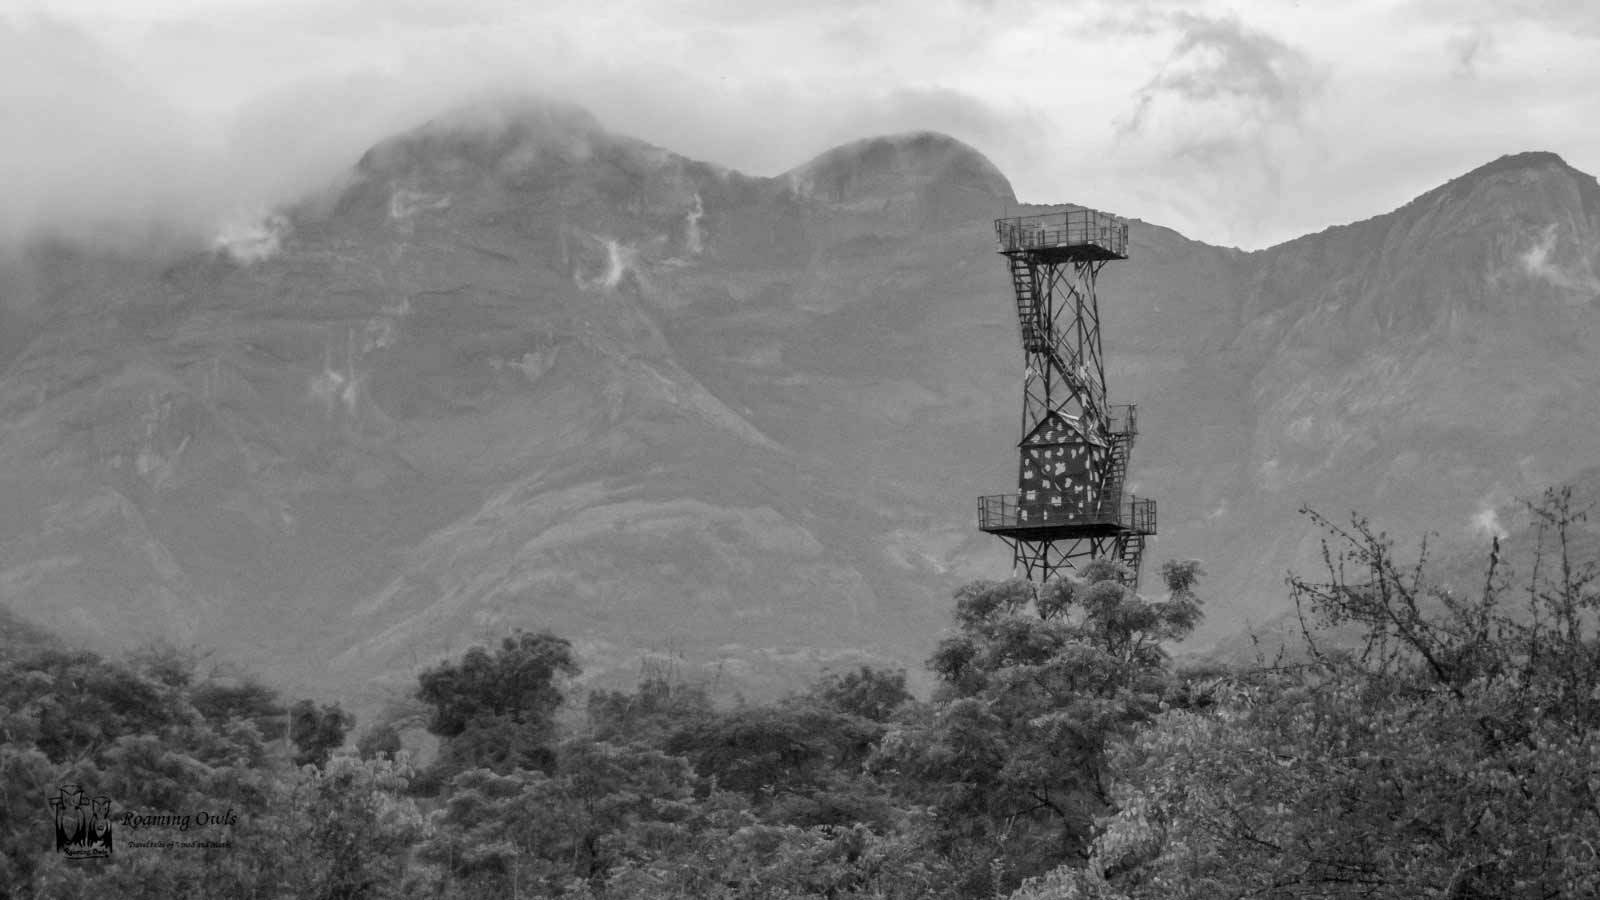 chinnar wildlife sanctuary,chinnar watch tower,western ghats watch tower